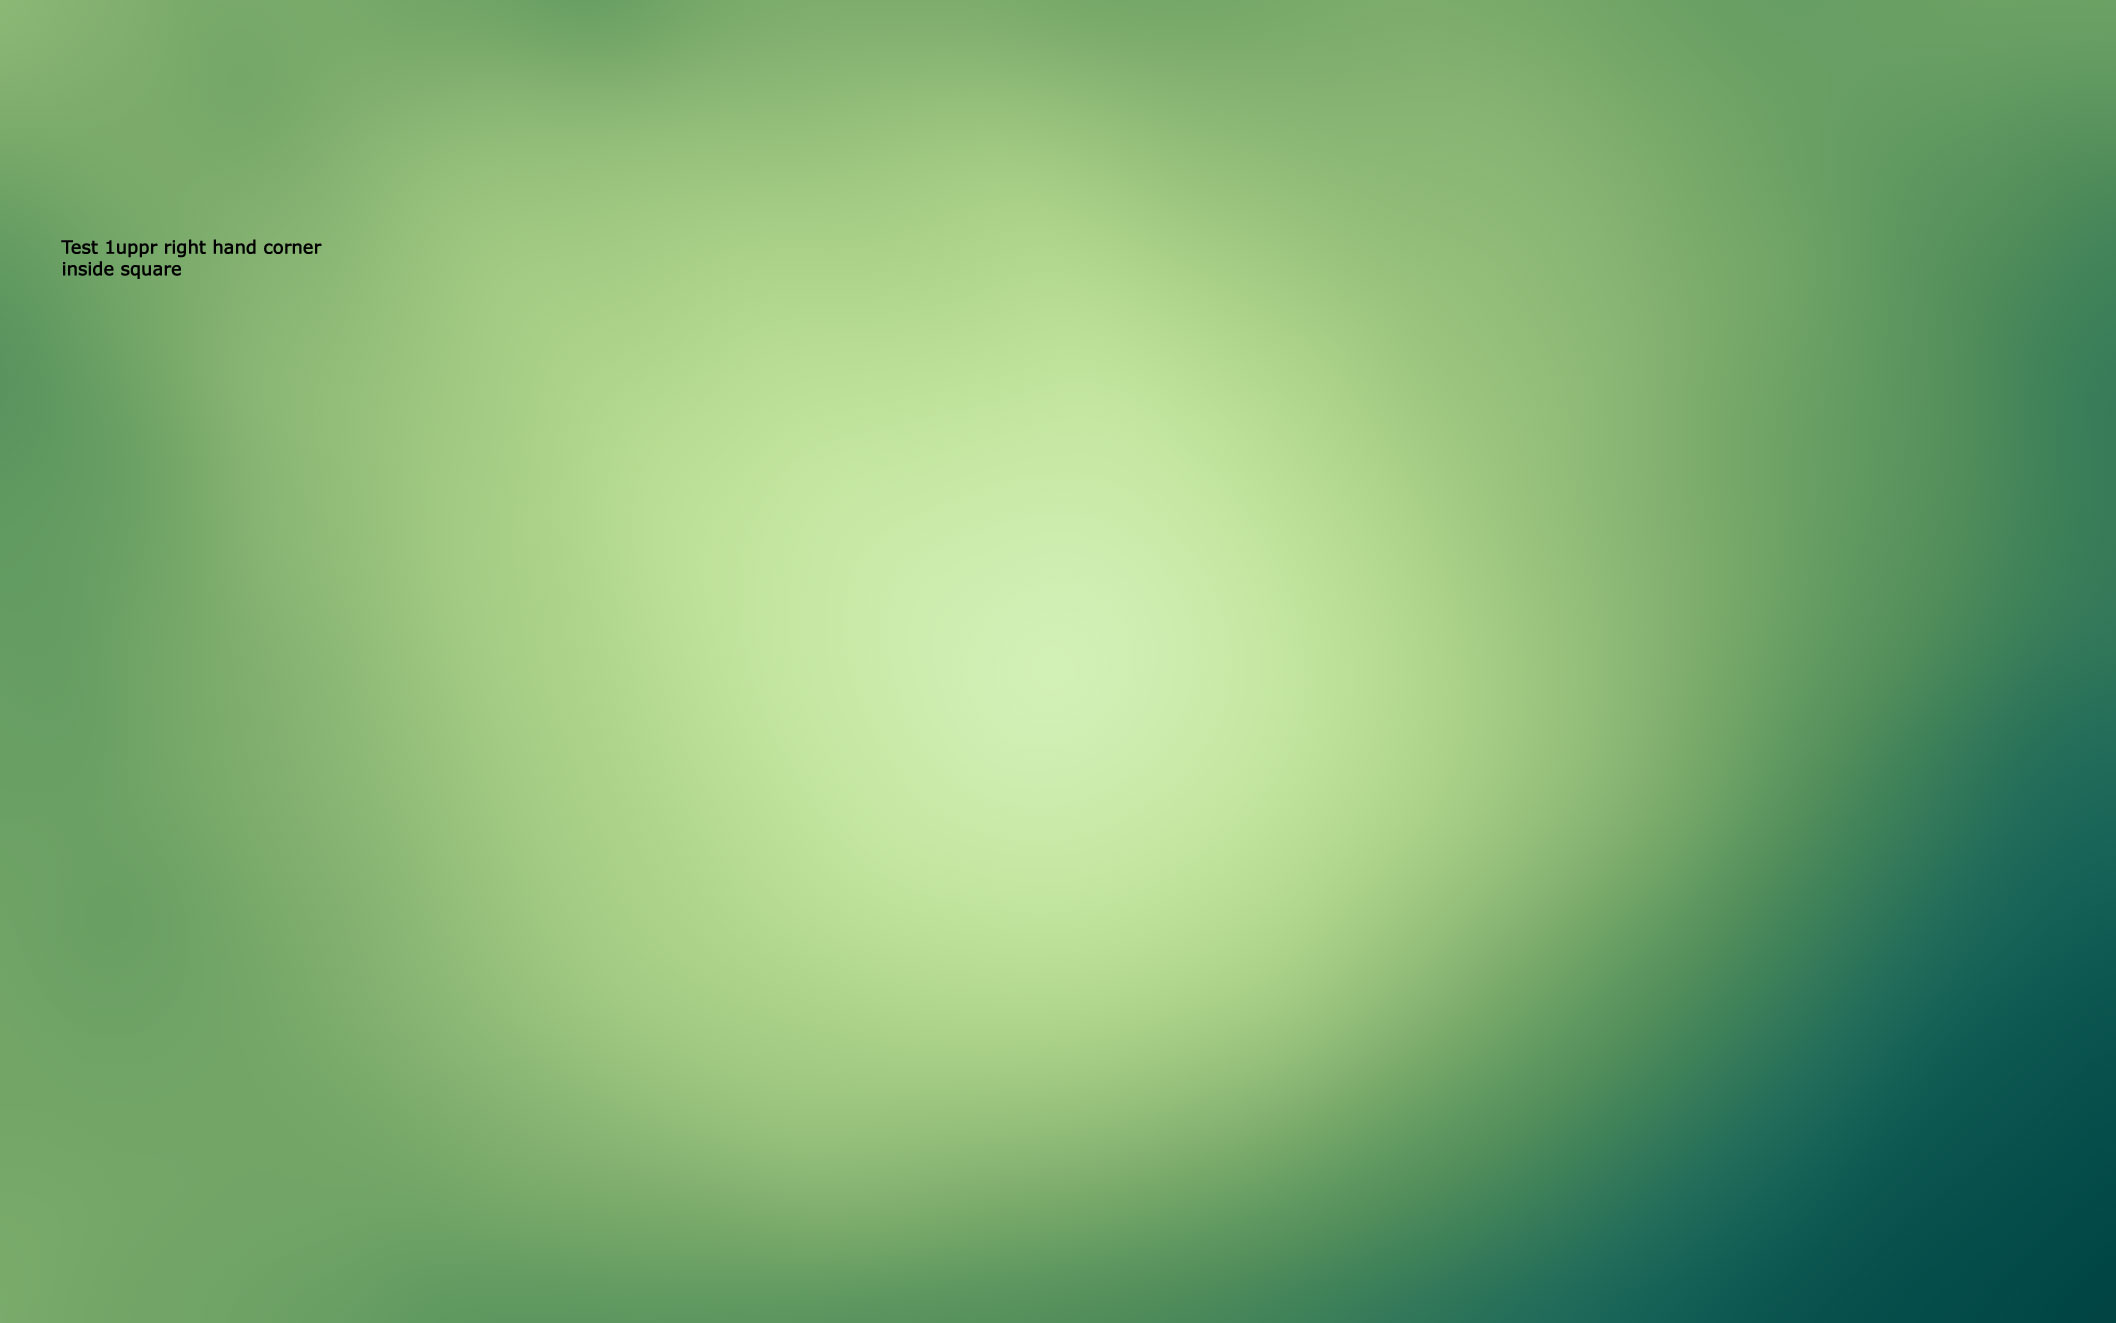 HD-Green-Background-July-23-2014-test-11.jpg